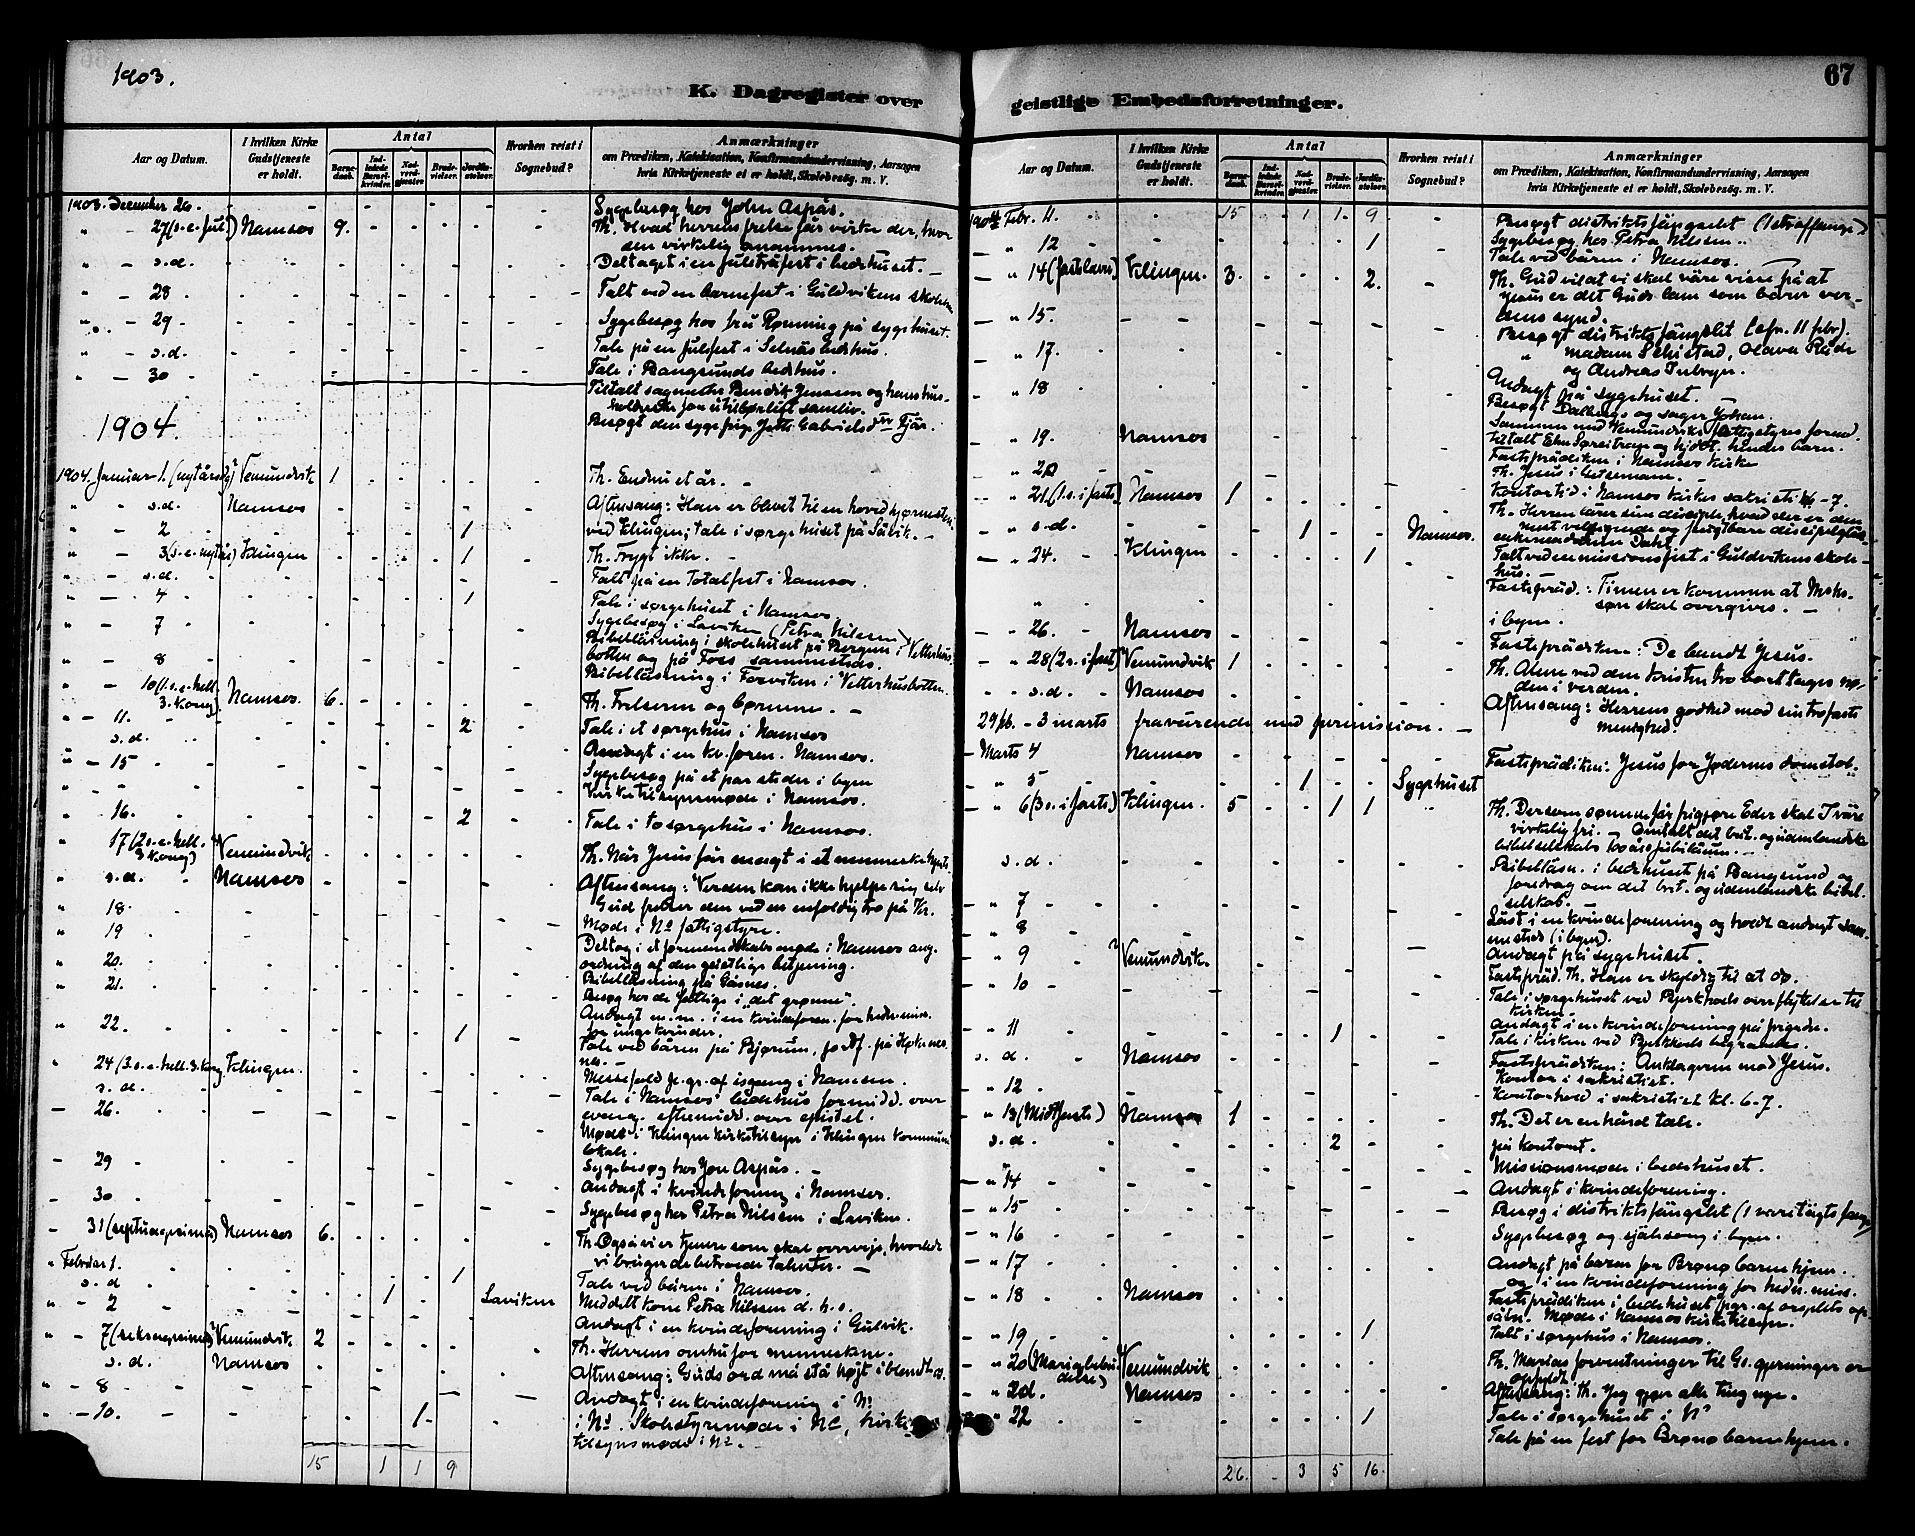 SAT, Ministerialprotokoller, klokkerbøker og fødselsregistre - Nord-Trøndelag, 768/L0575: Dagregister nr. 766A09, 1889-1931, s. 67